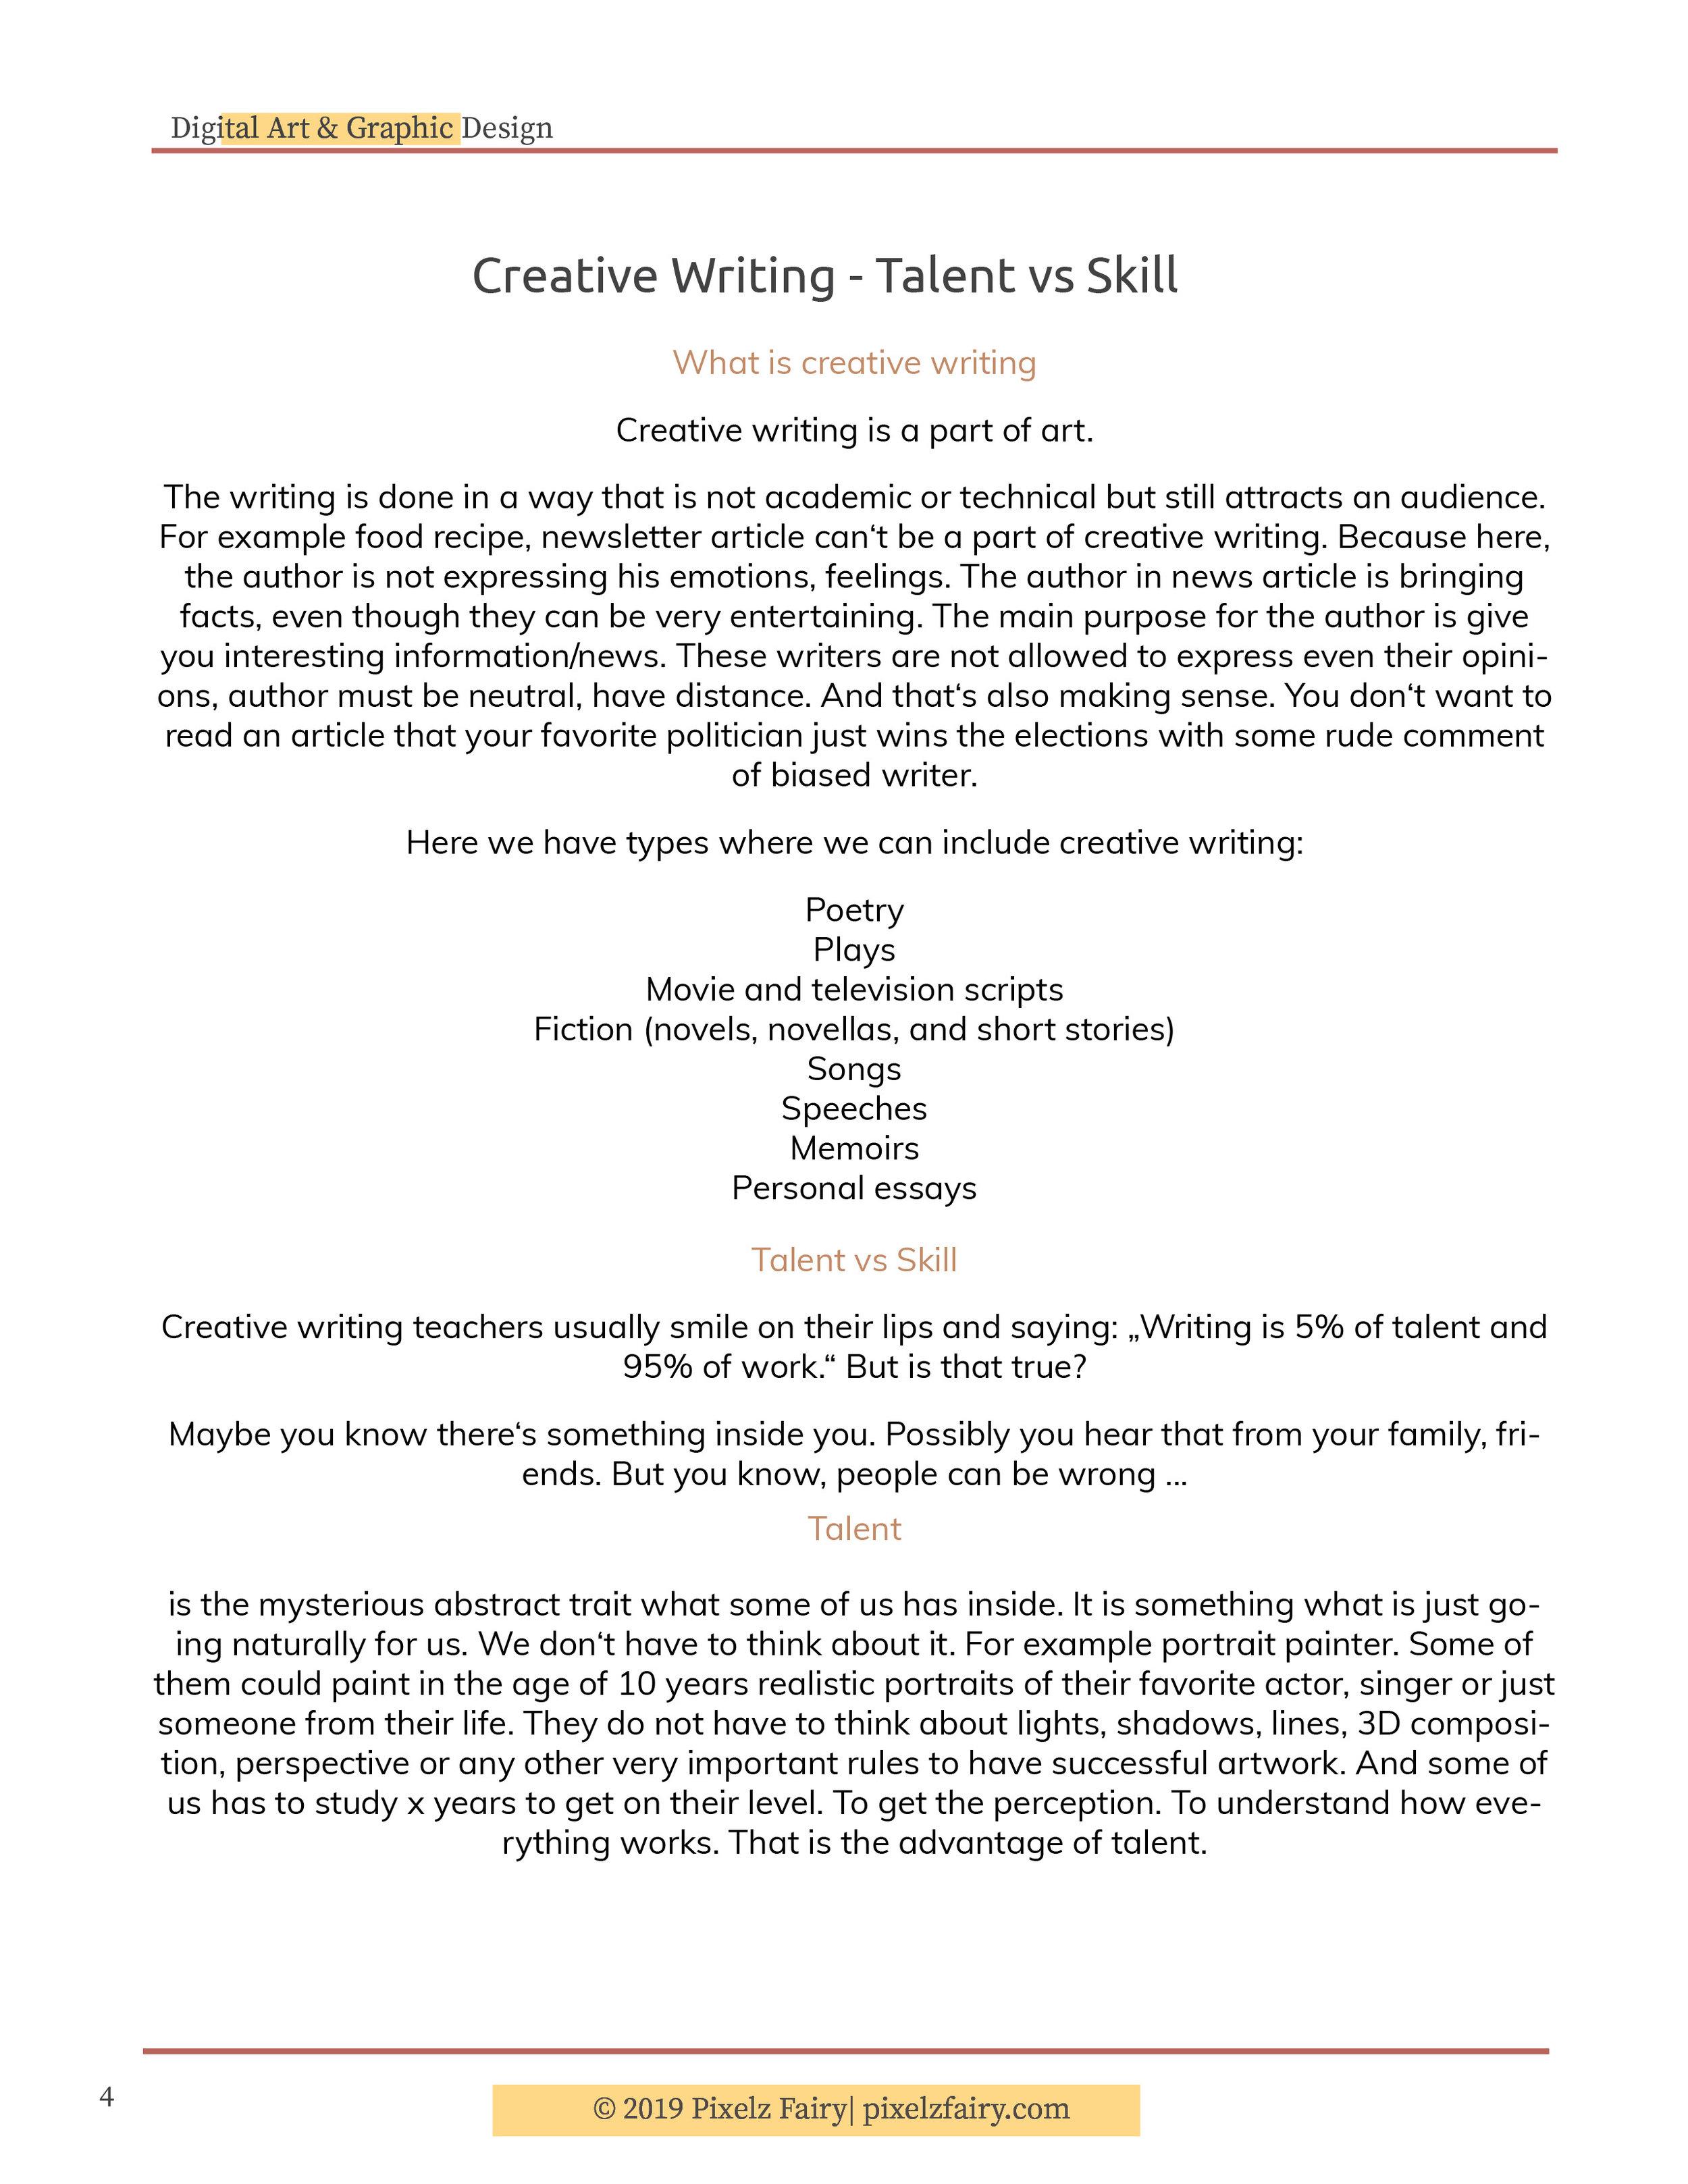 Seeking The Creativity4.jpg